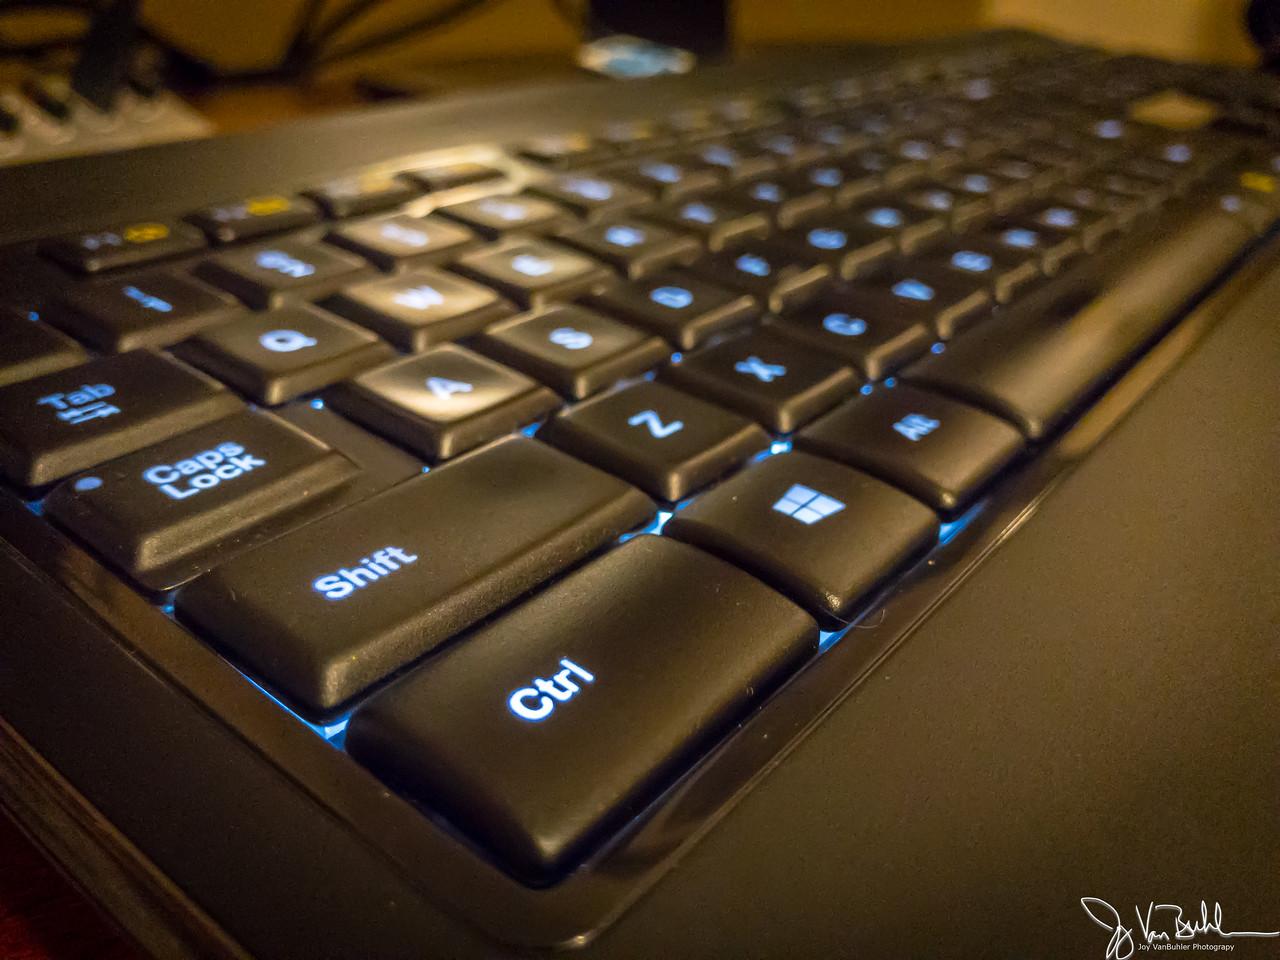 17/365 - Keyboard